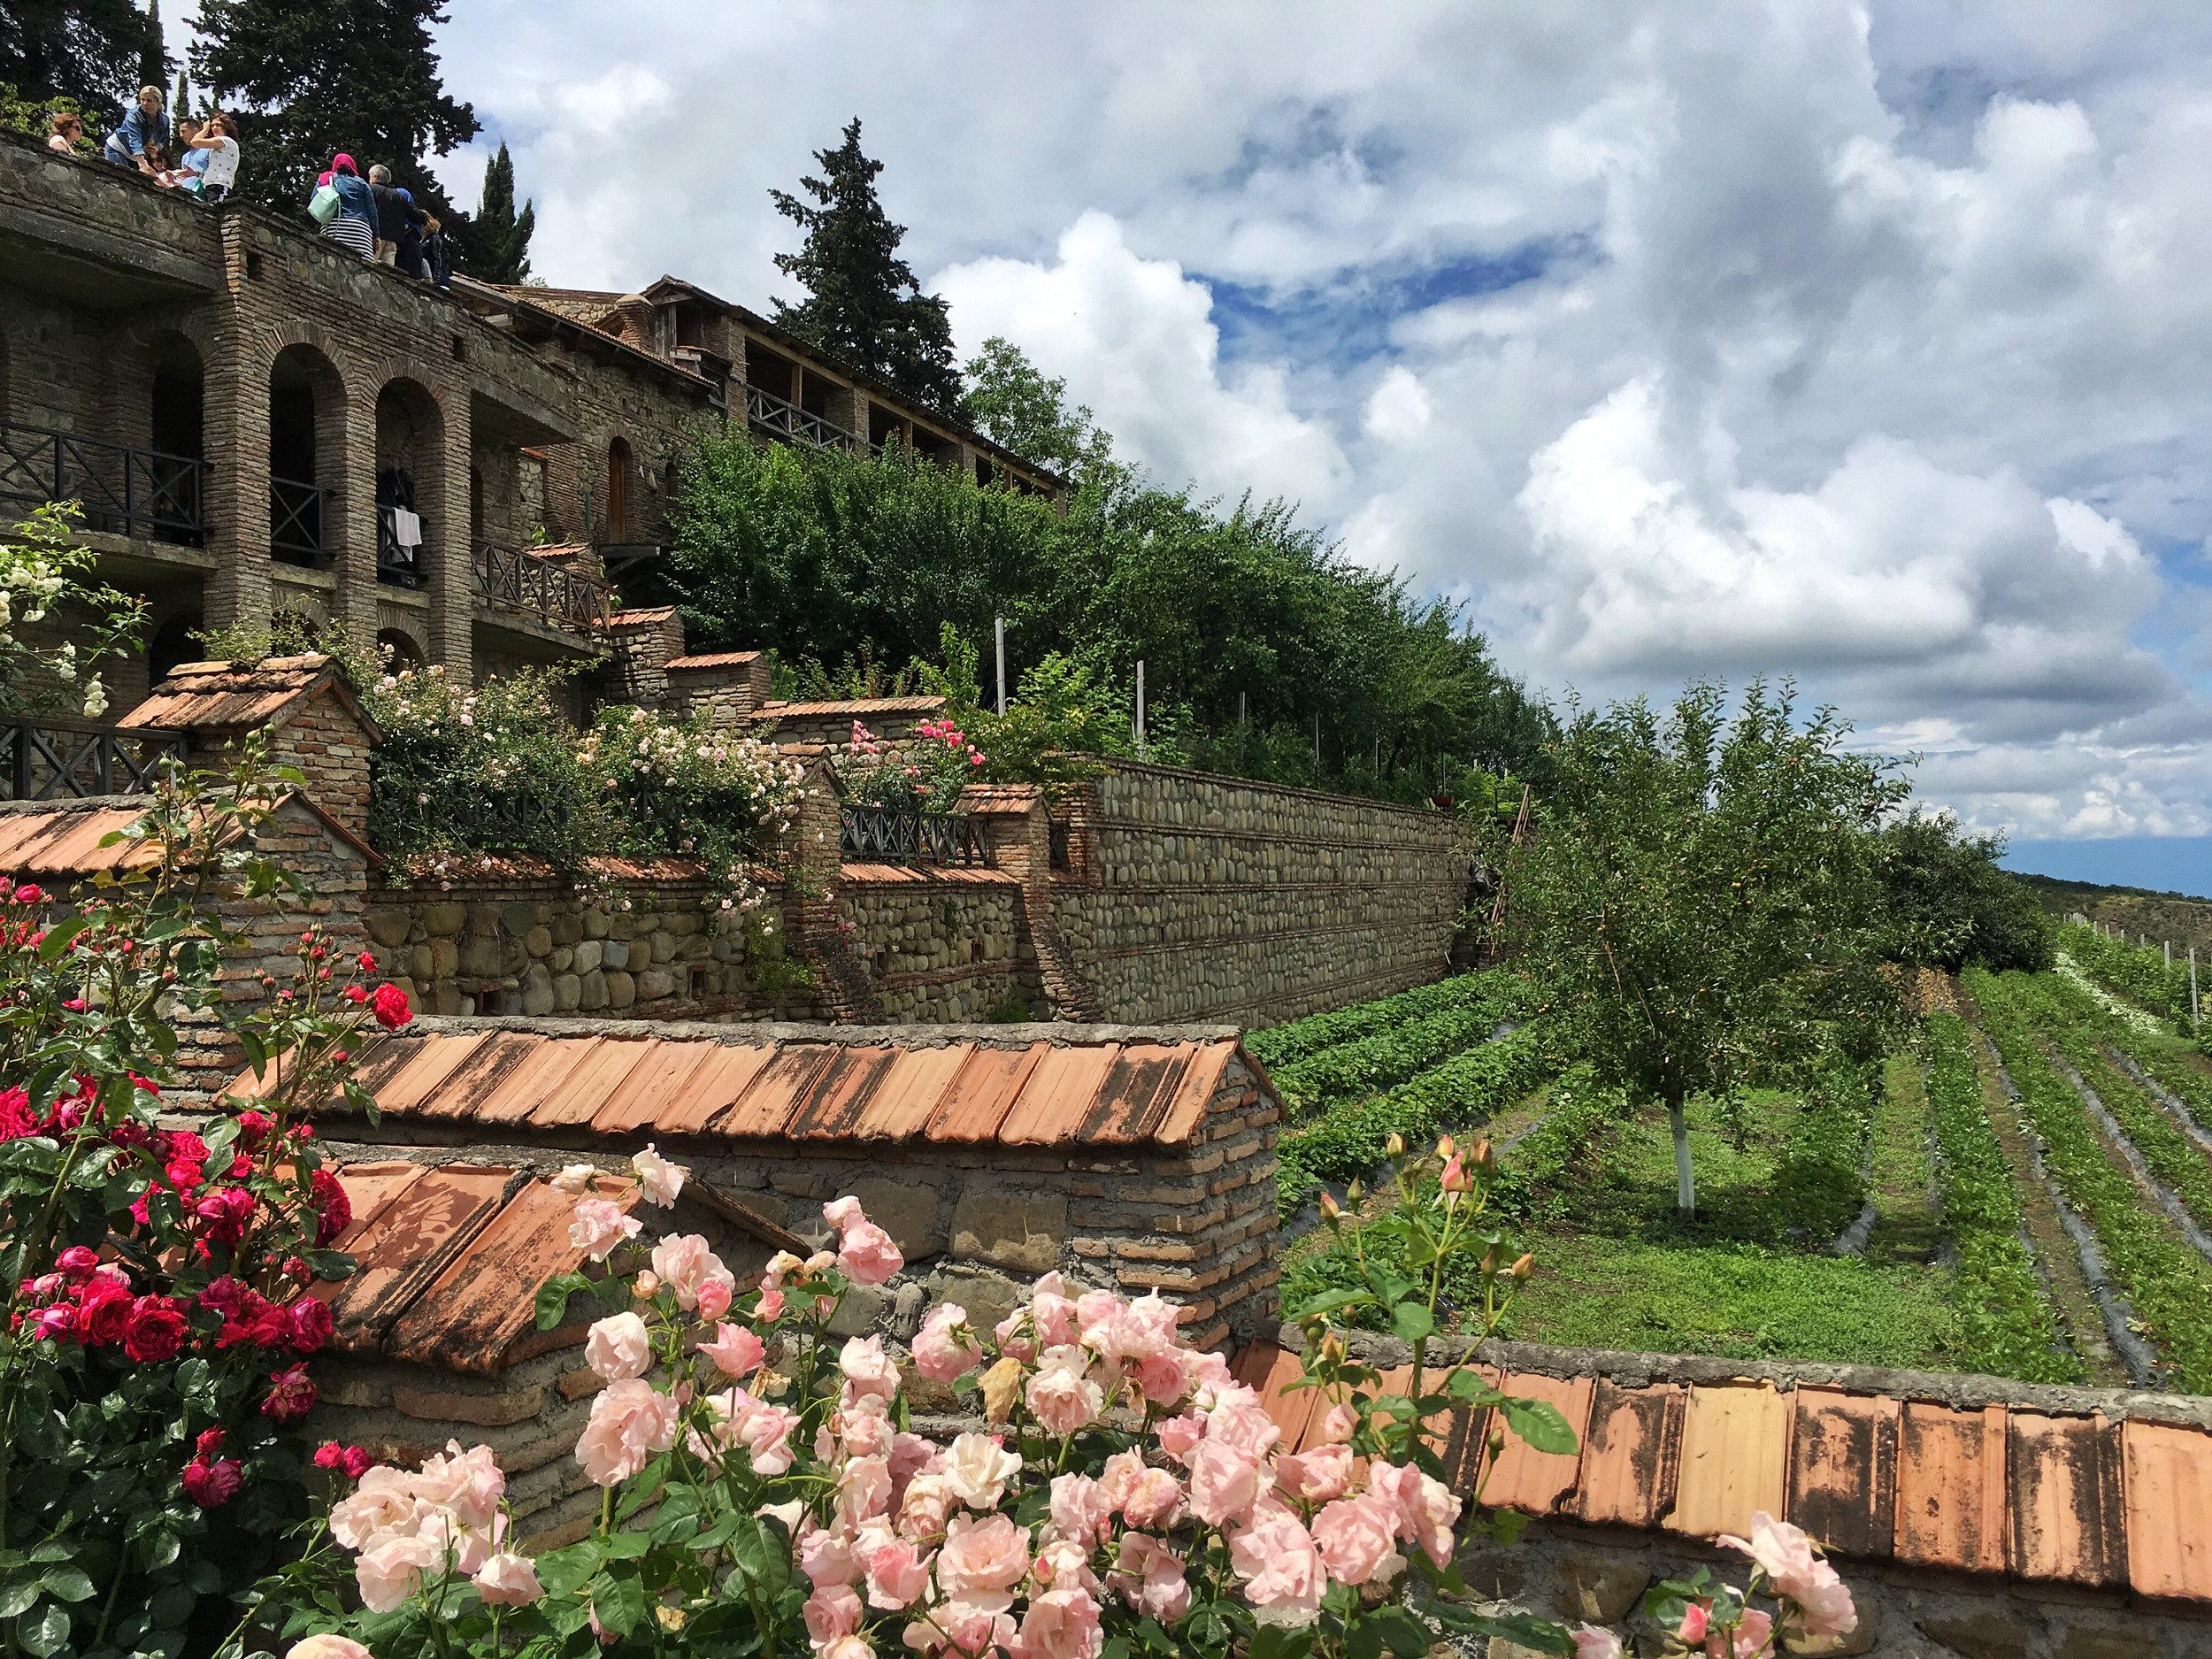 Roses and veggies at St. Ninos Monastery